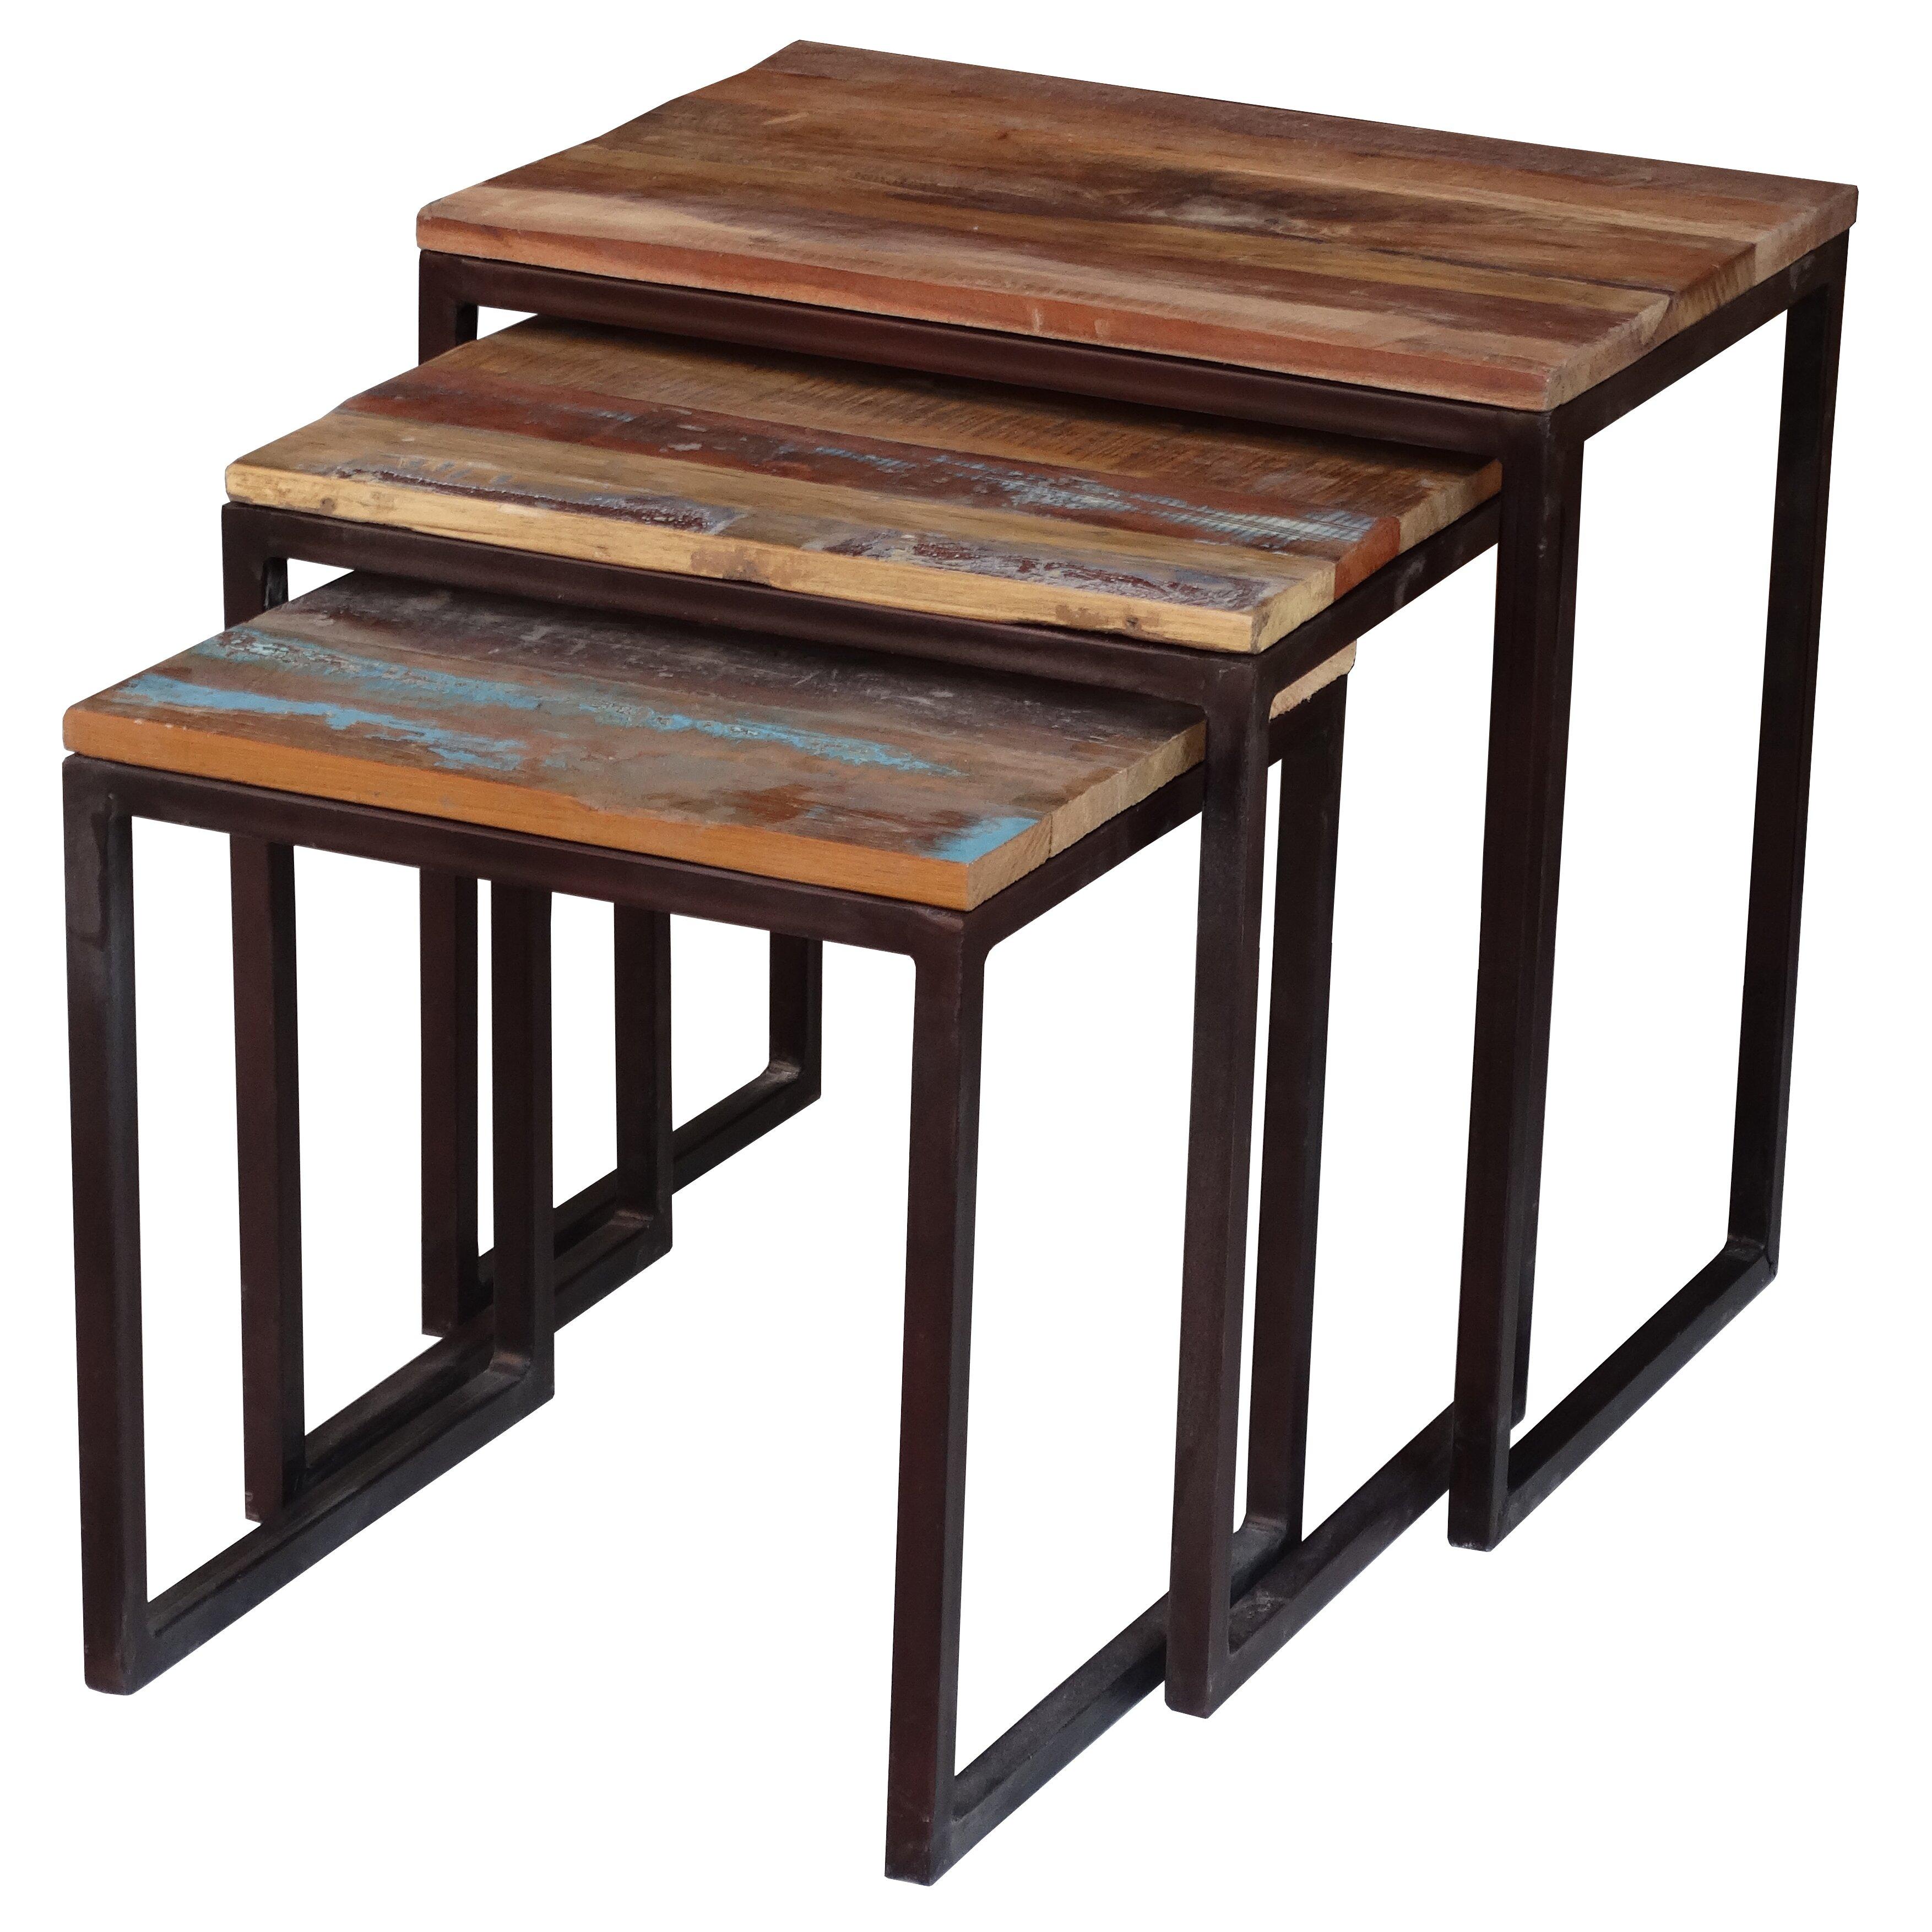 bungalow rose zara 3 piece nesting tables reviews wayfair. Black Bedroom Furniture Sets. Home Design Ideas